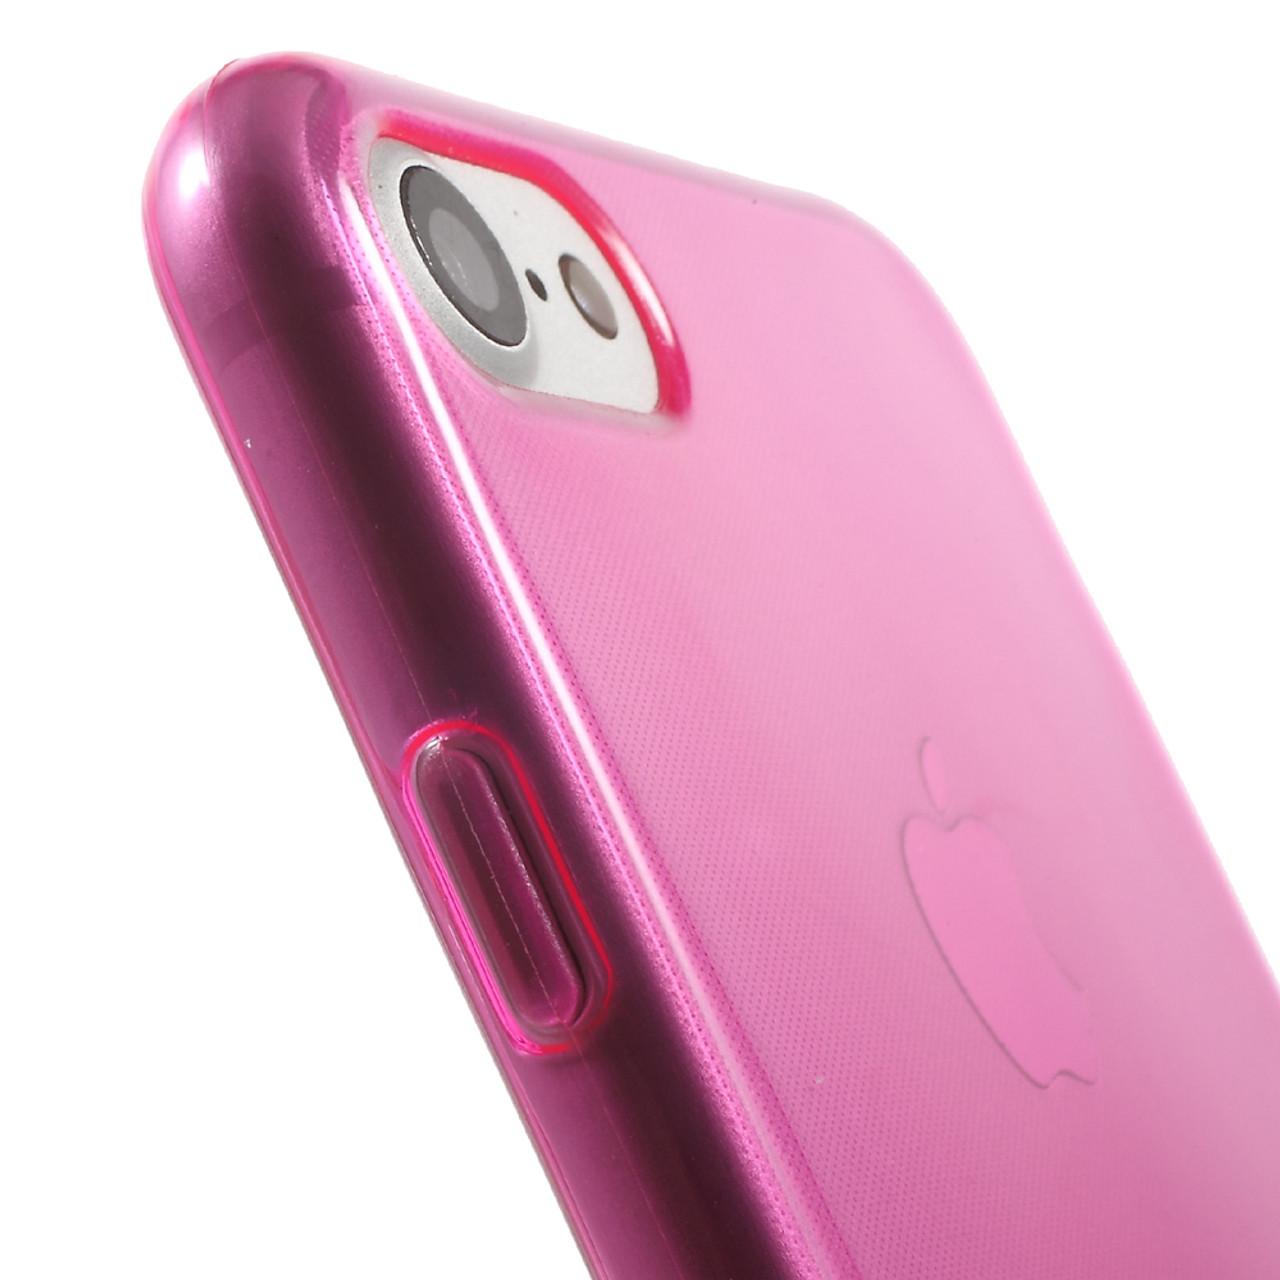 iphone 7 silicone case pink. Black Bedroom Furniture Sets. Home Design Ideas